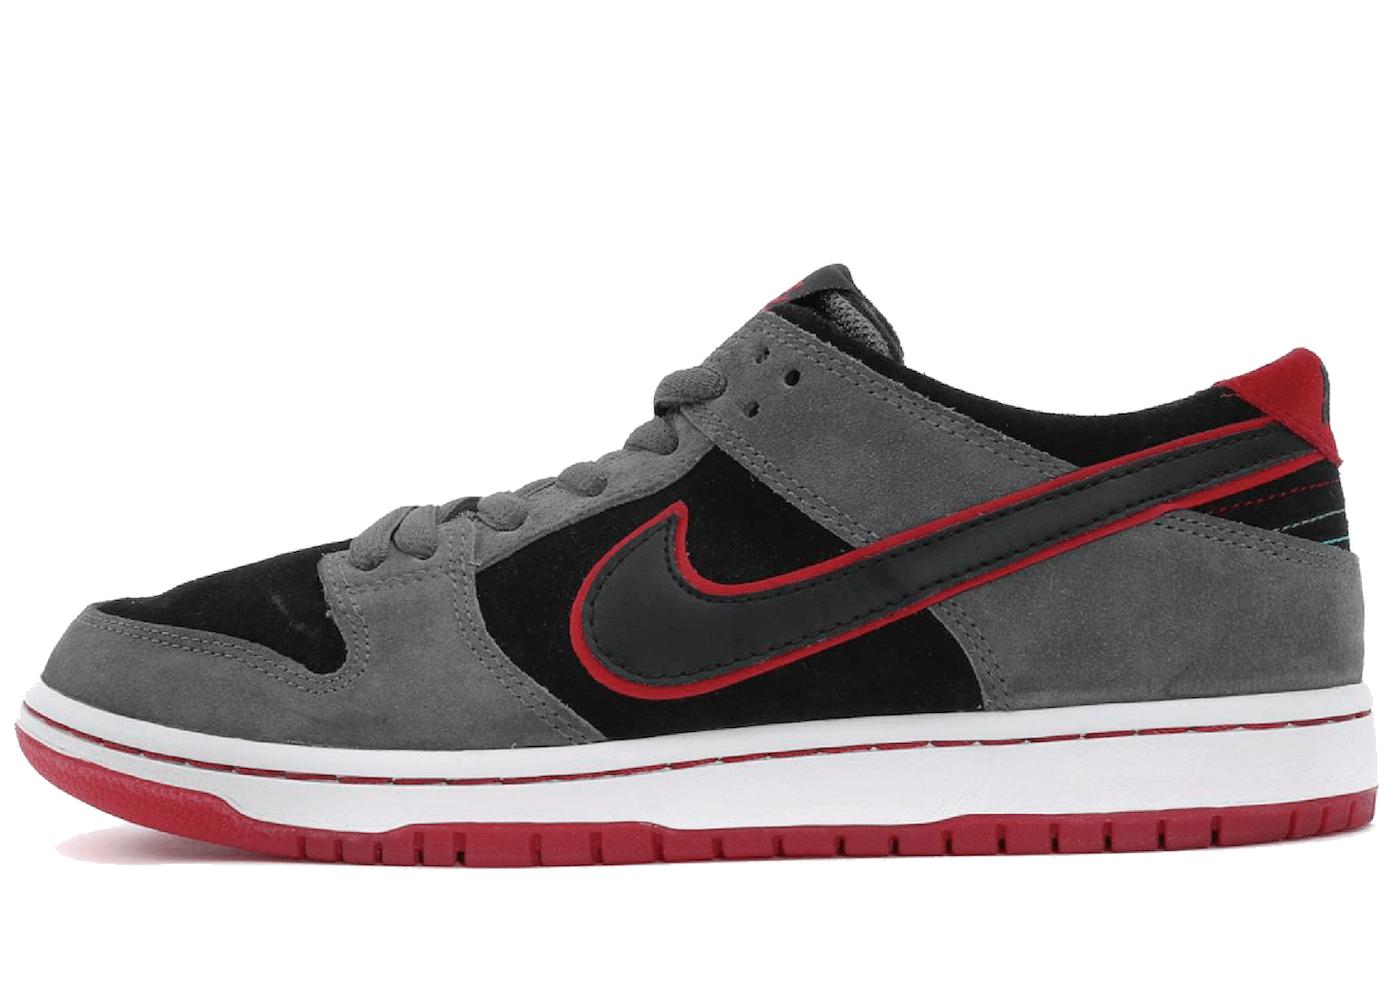 Nike SB Dunk Low Ishod Wair Dark Greyの写真